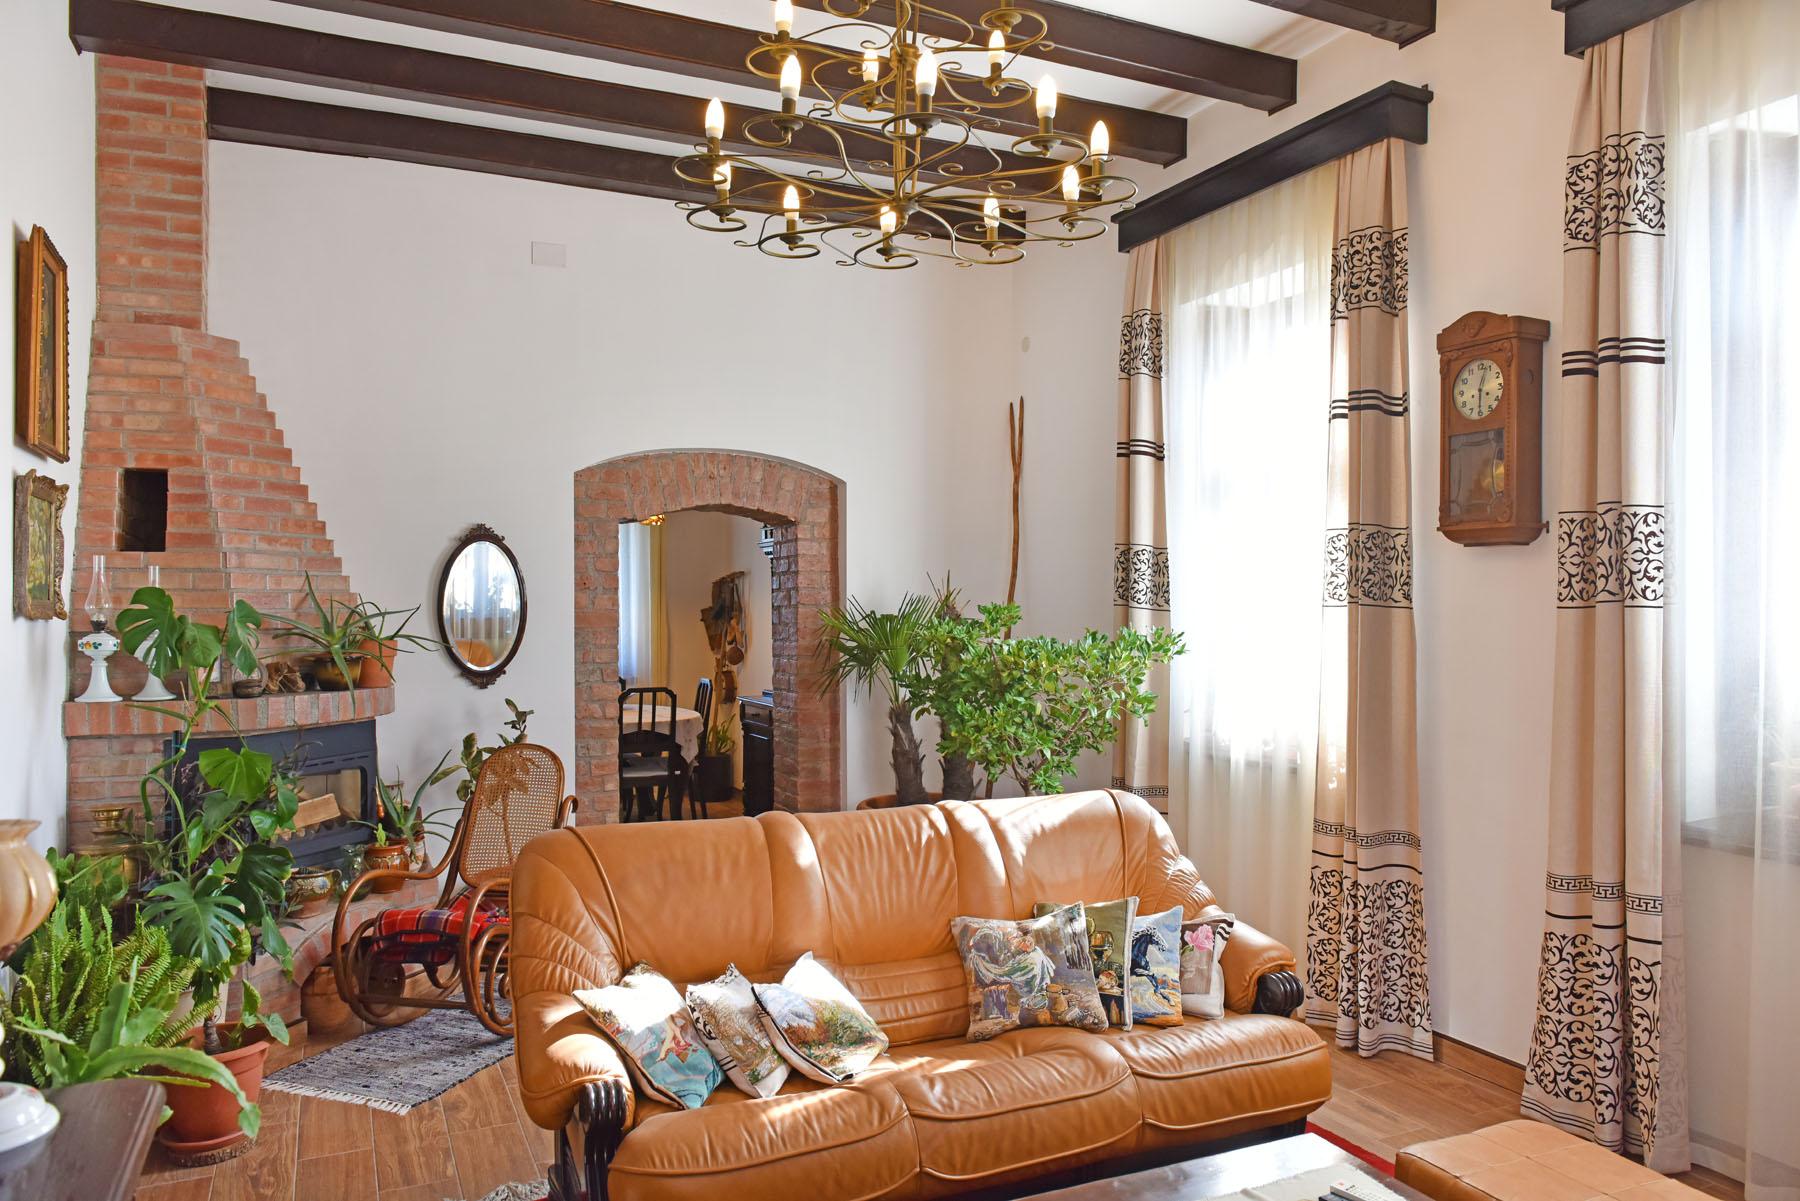 https://ahe-ro.s3.amazonaws.com/8999/conacul-dalles-de-vanzare-artmark-hsitorical-estate-%2812%29.jpg